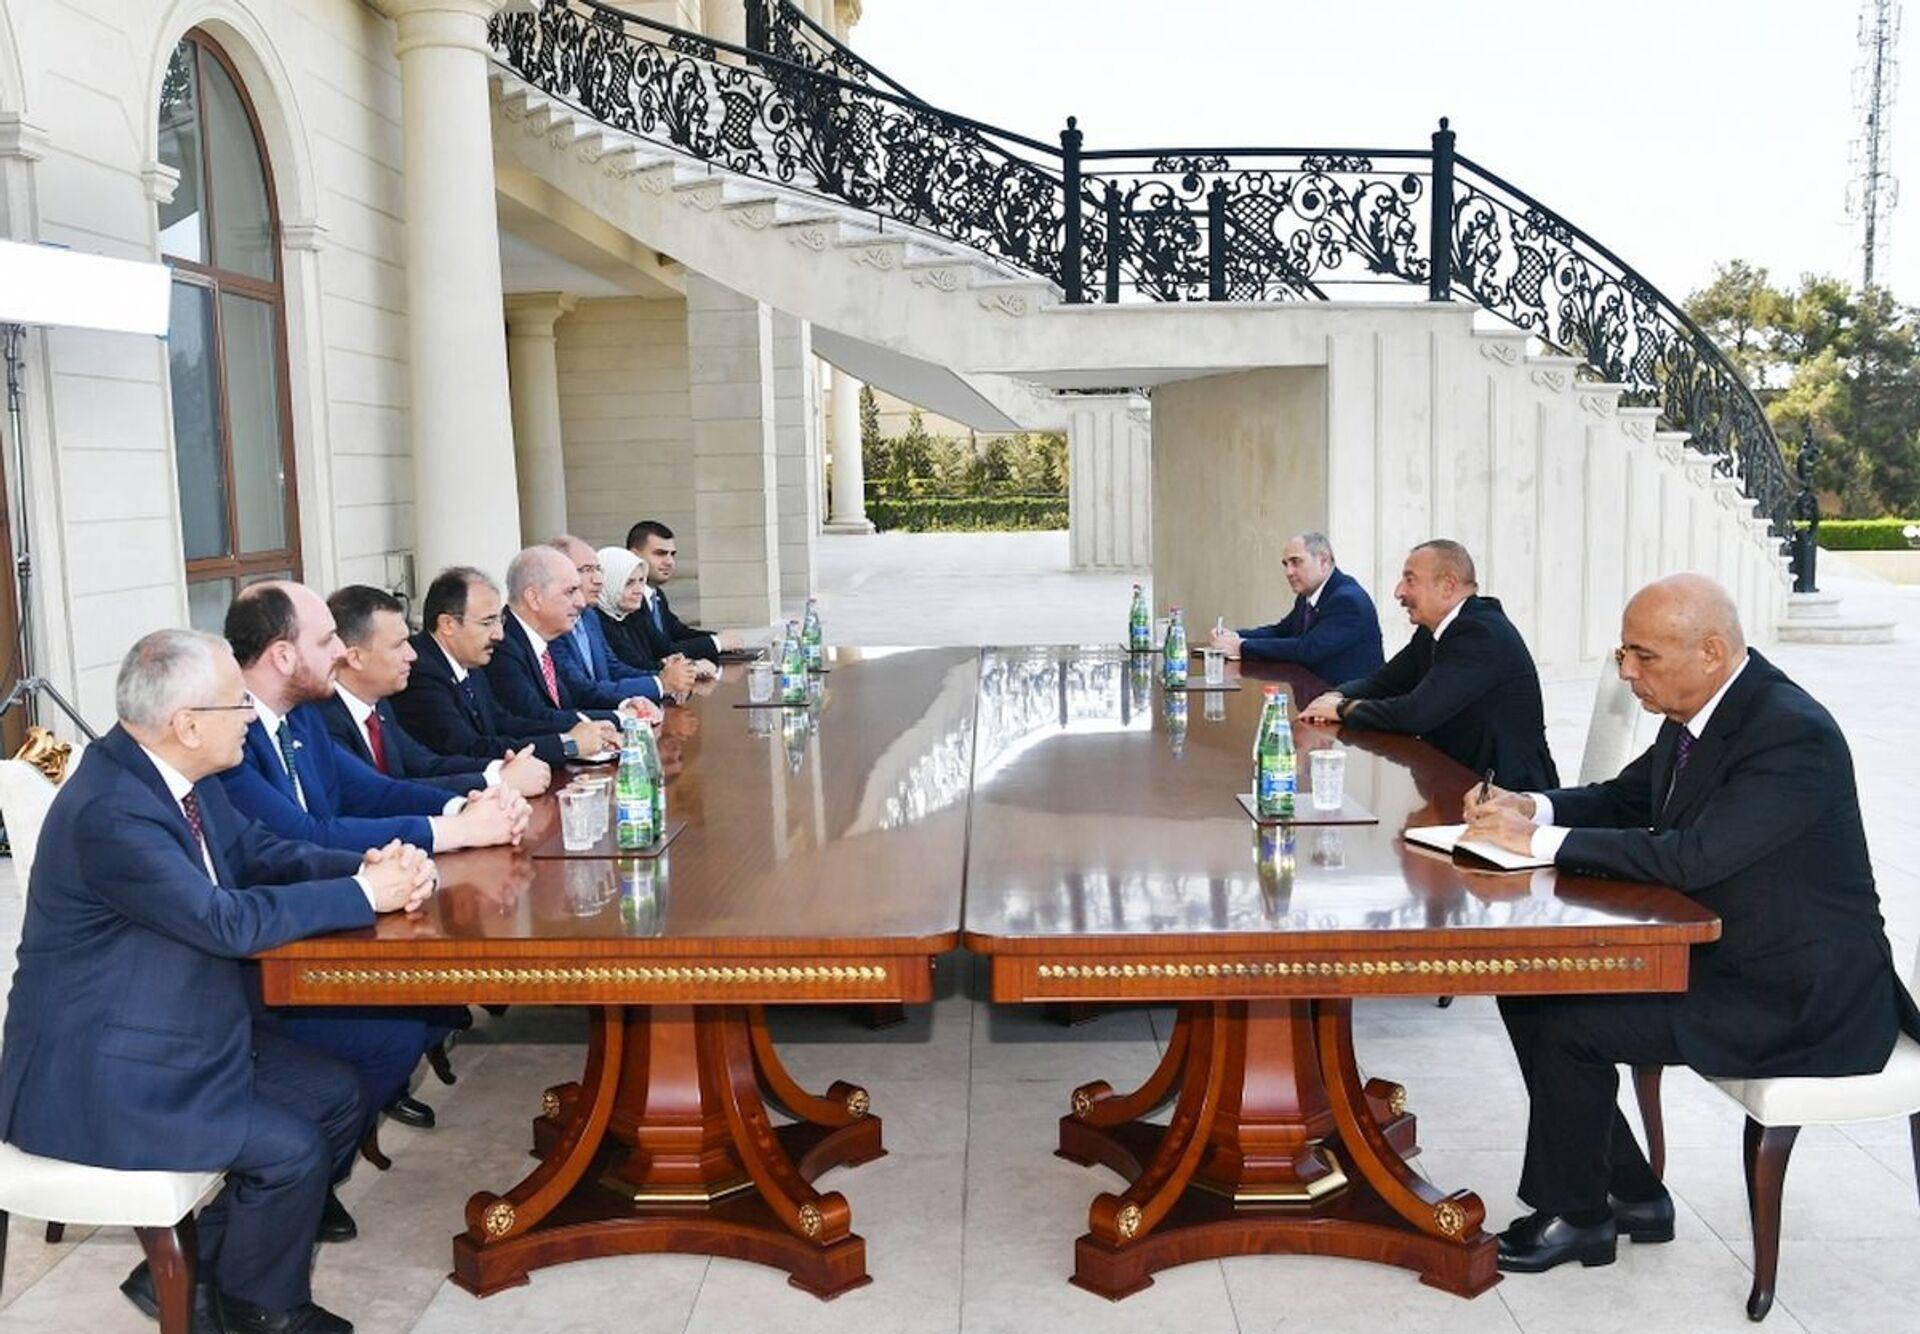 Президент Азербайджана принял представителей правящей партии Турции - Sputnik Азербайджан, 1920, 26.07.2021